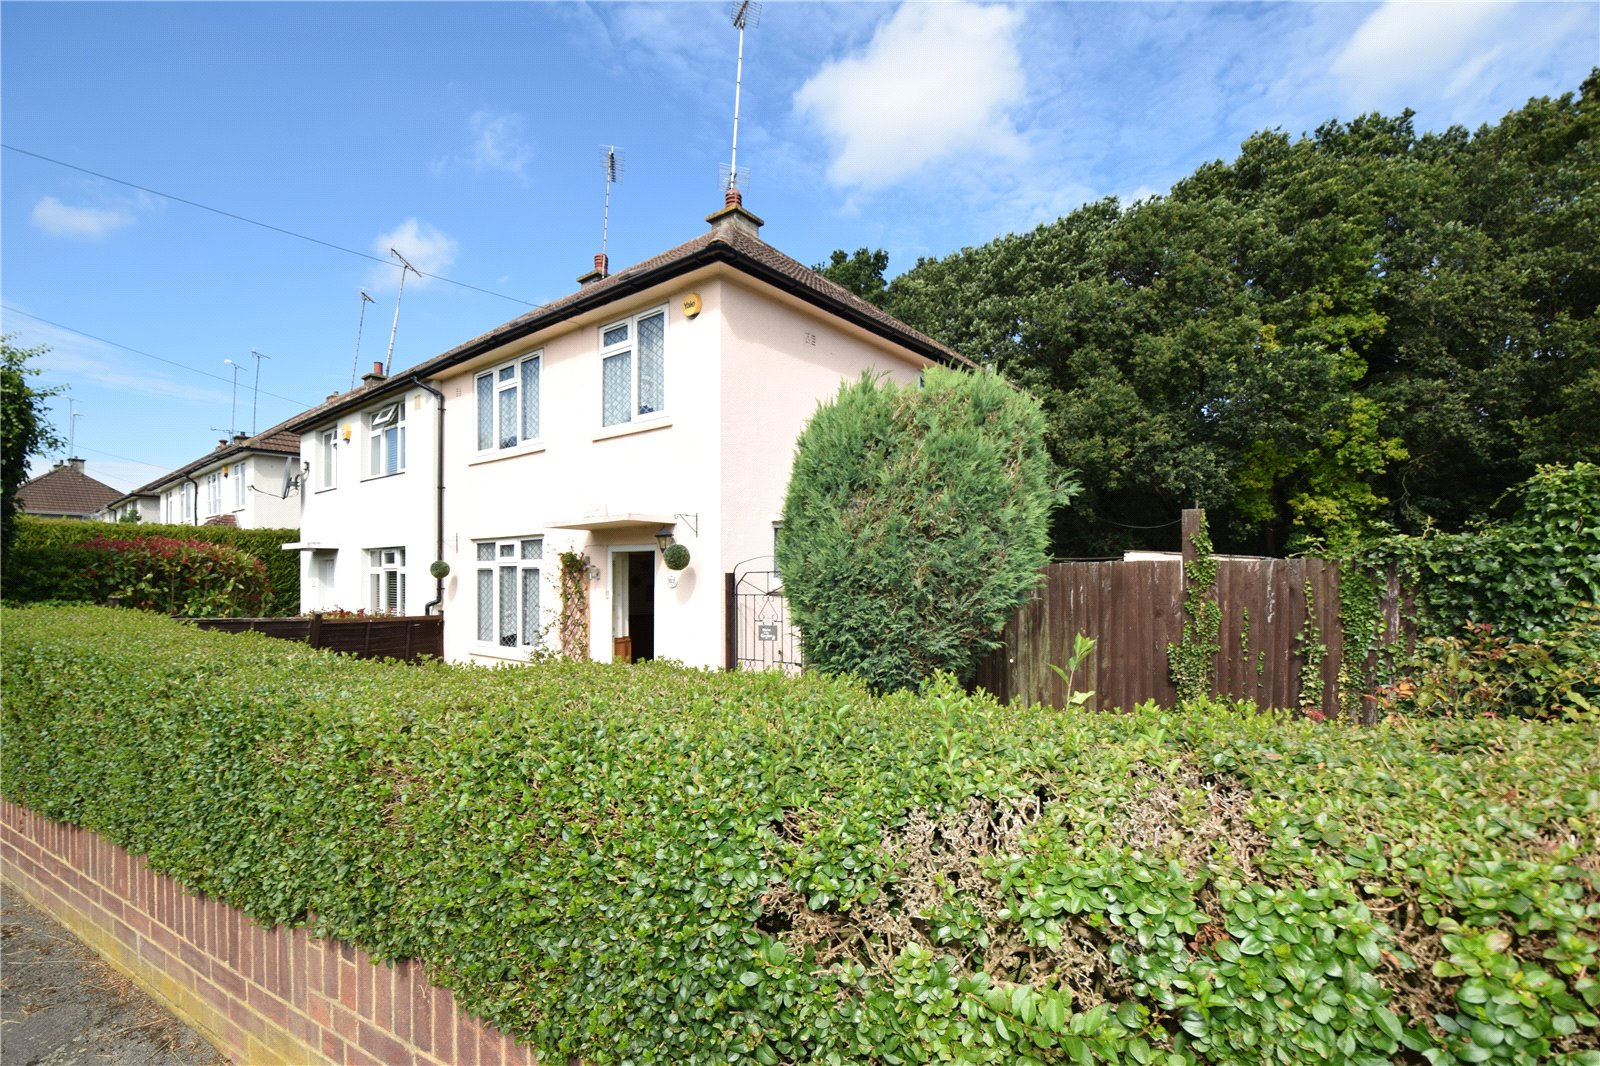 Leechcroft Avenue, Swanley, Kent, BR8